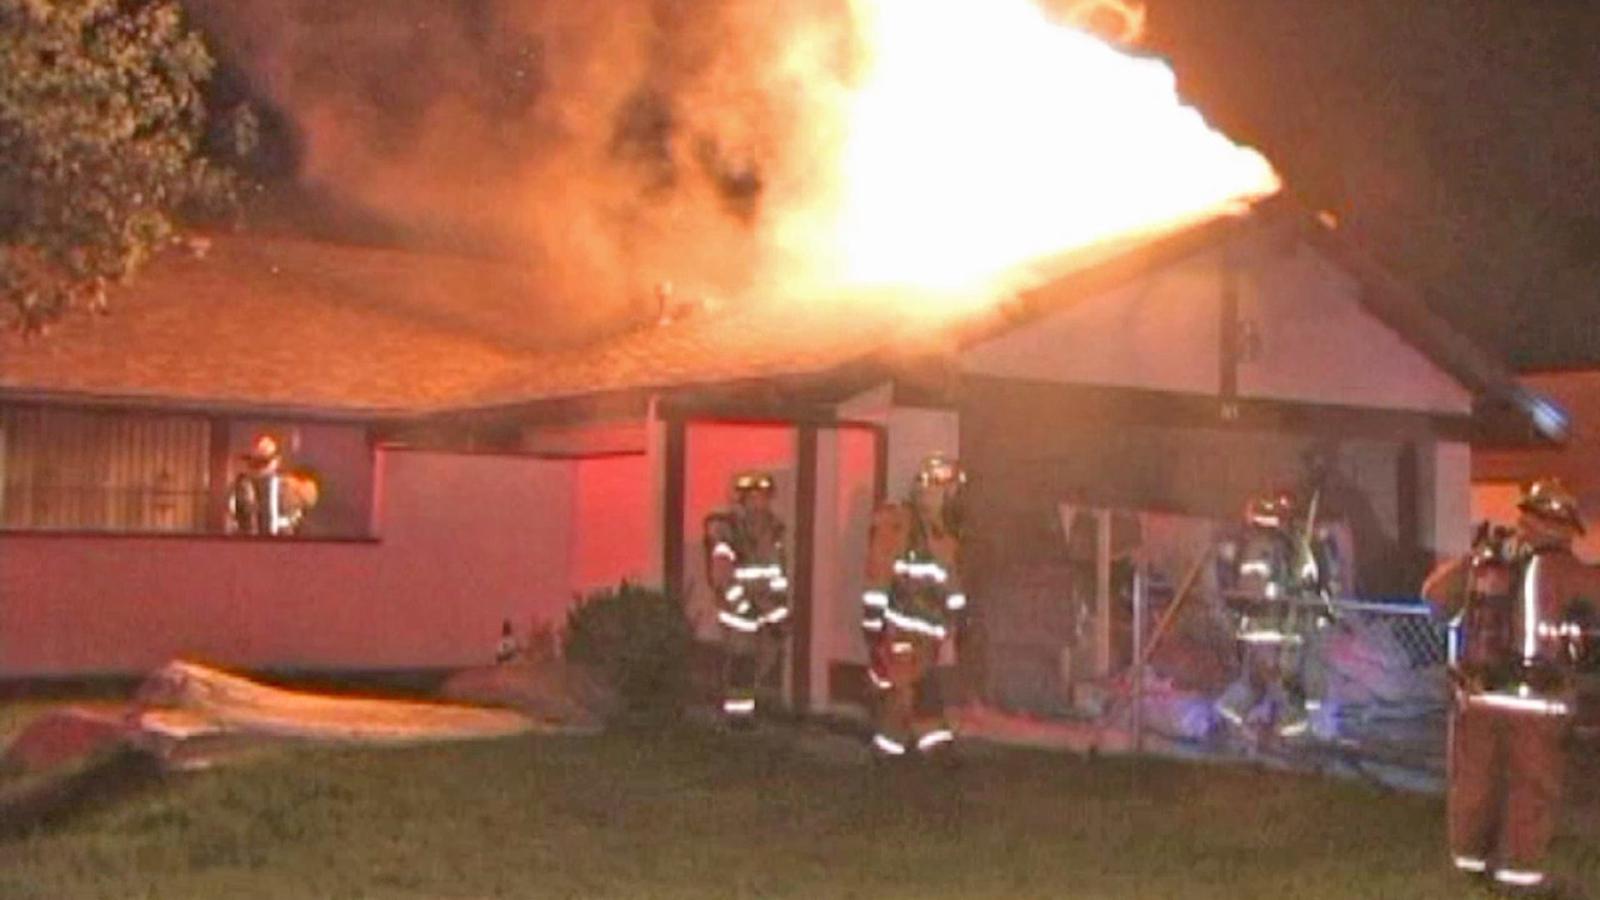 San Bernardino House Fire 400 500 Marijuana Plants Found